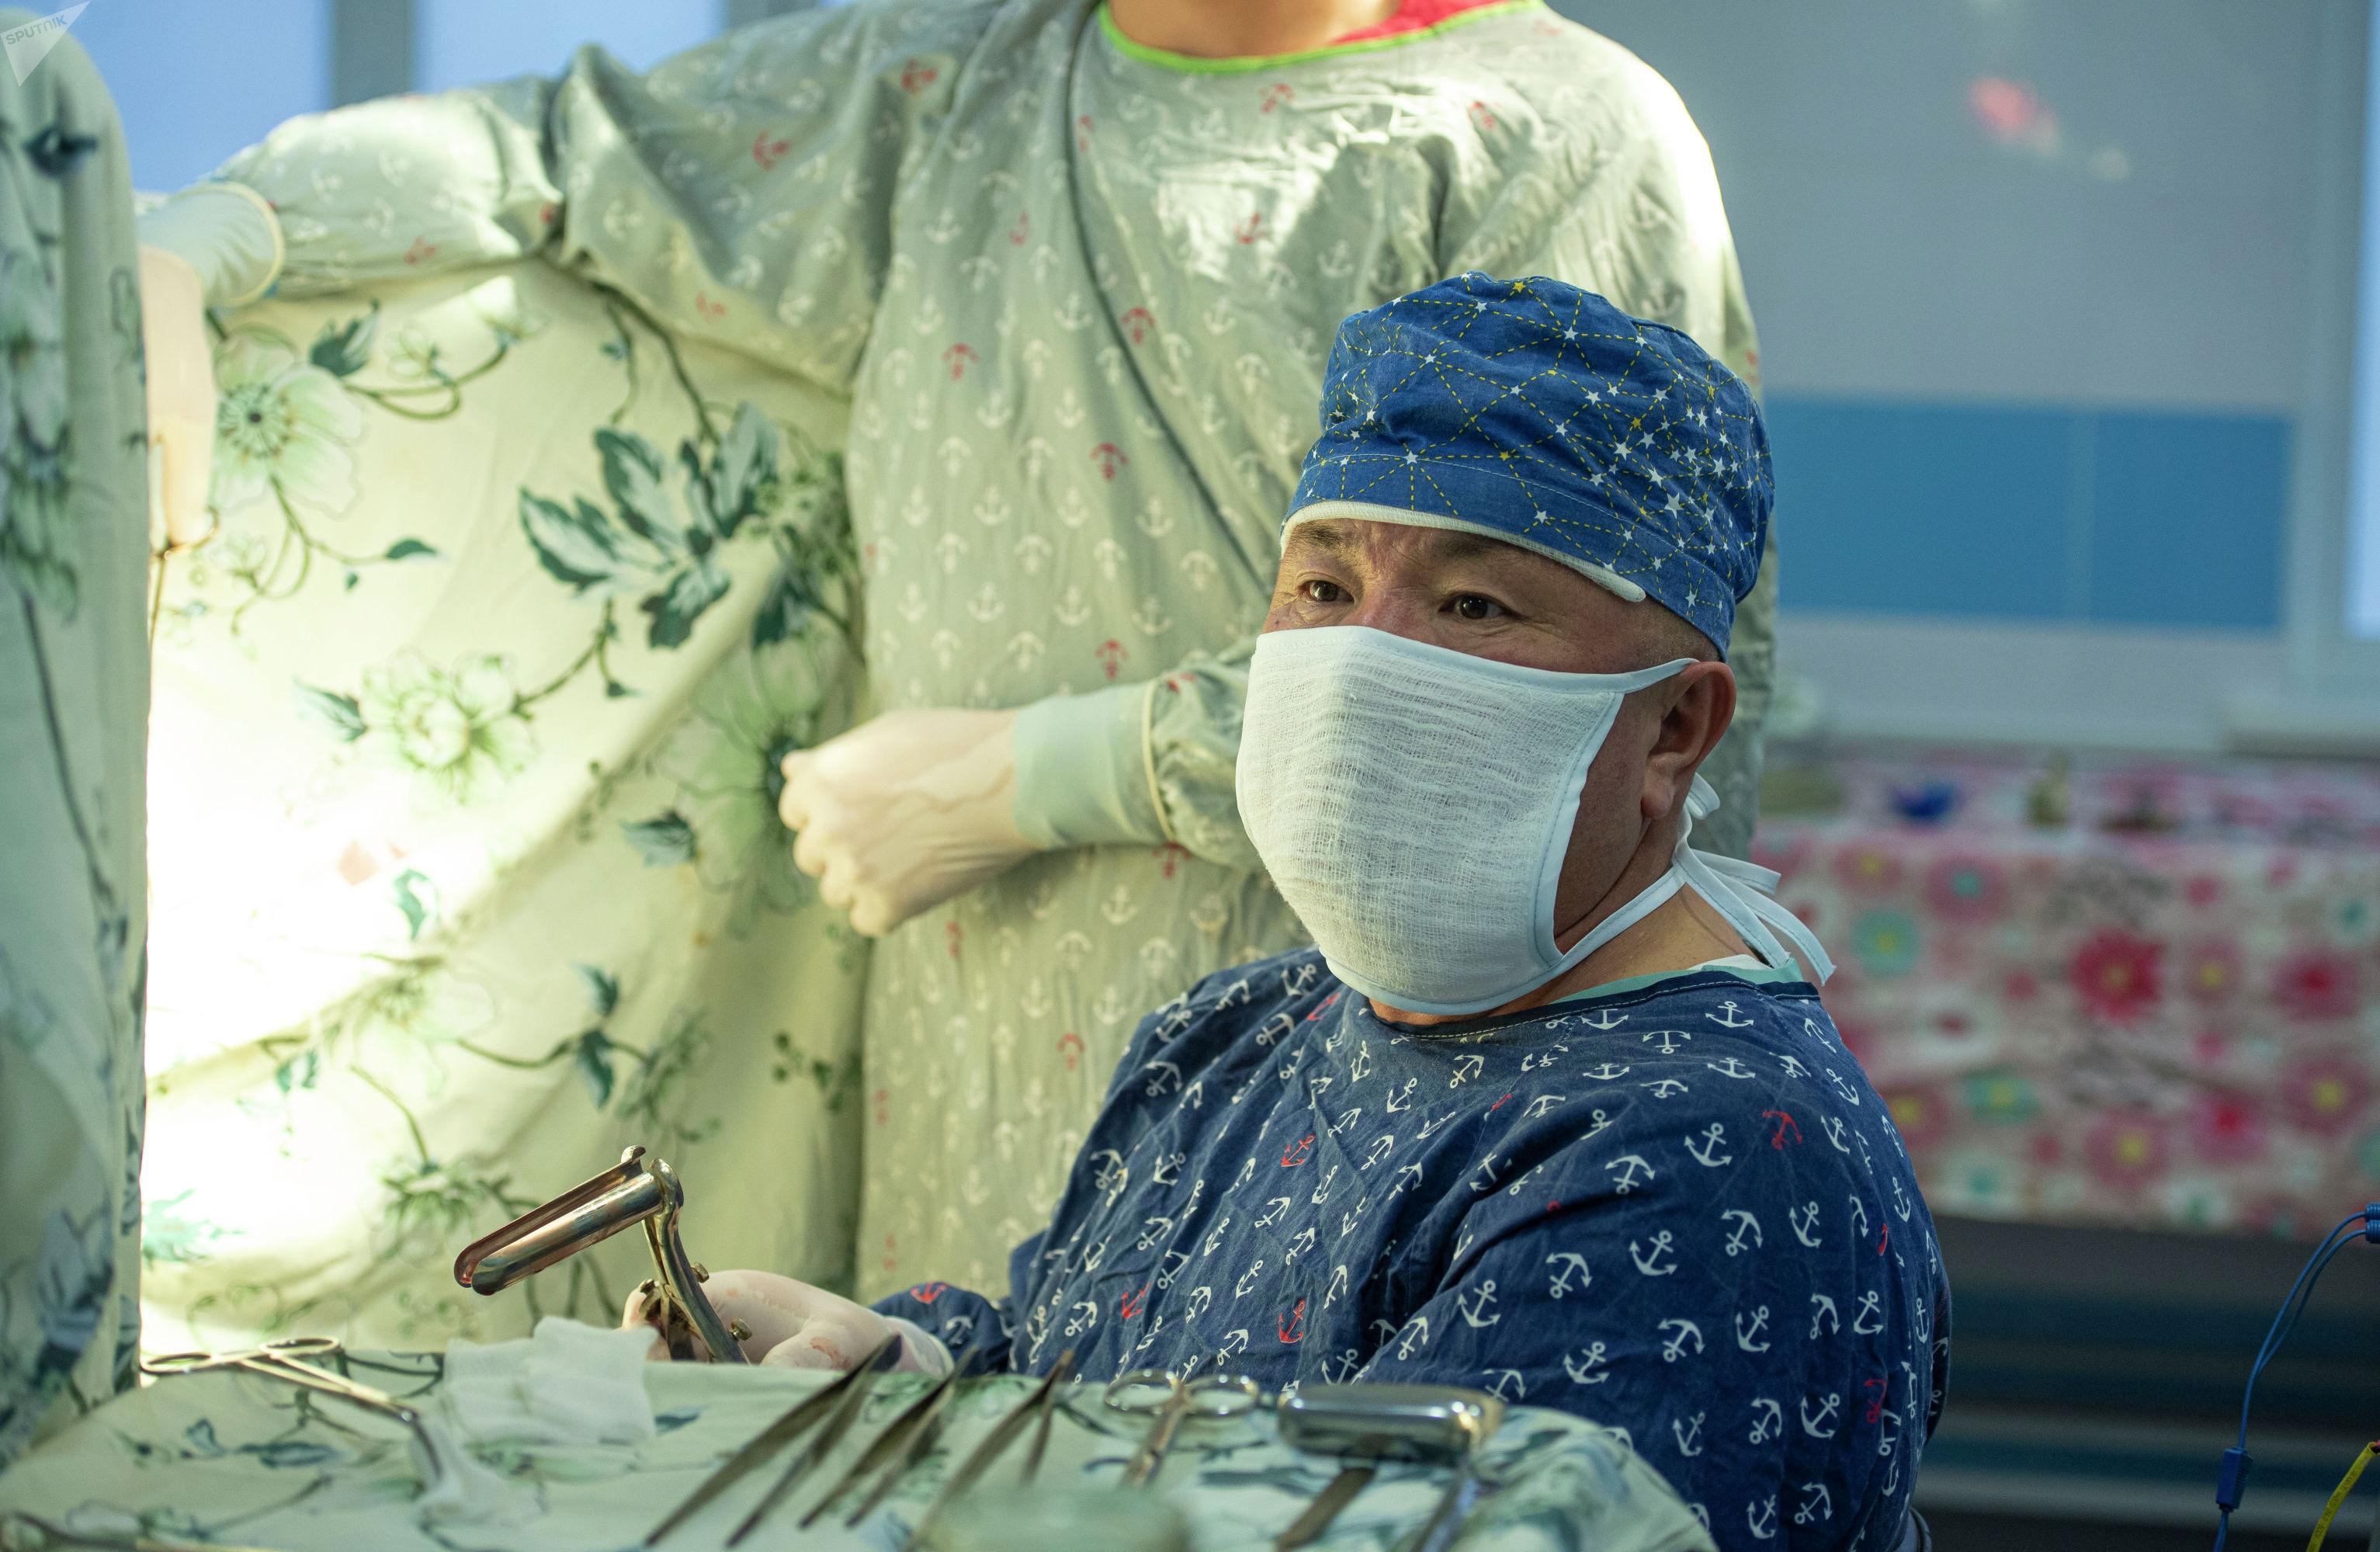 Кыргызстанский нейрохирург Абдыракман Дуйшобаев во время операции